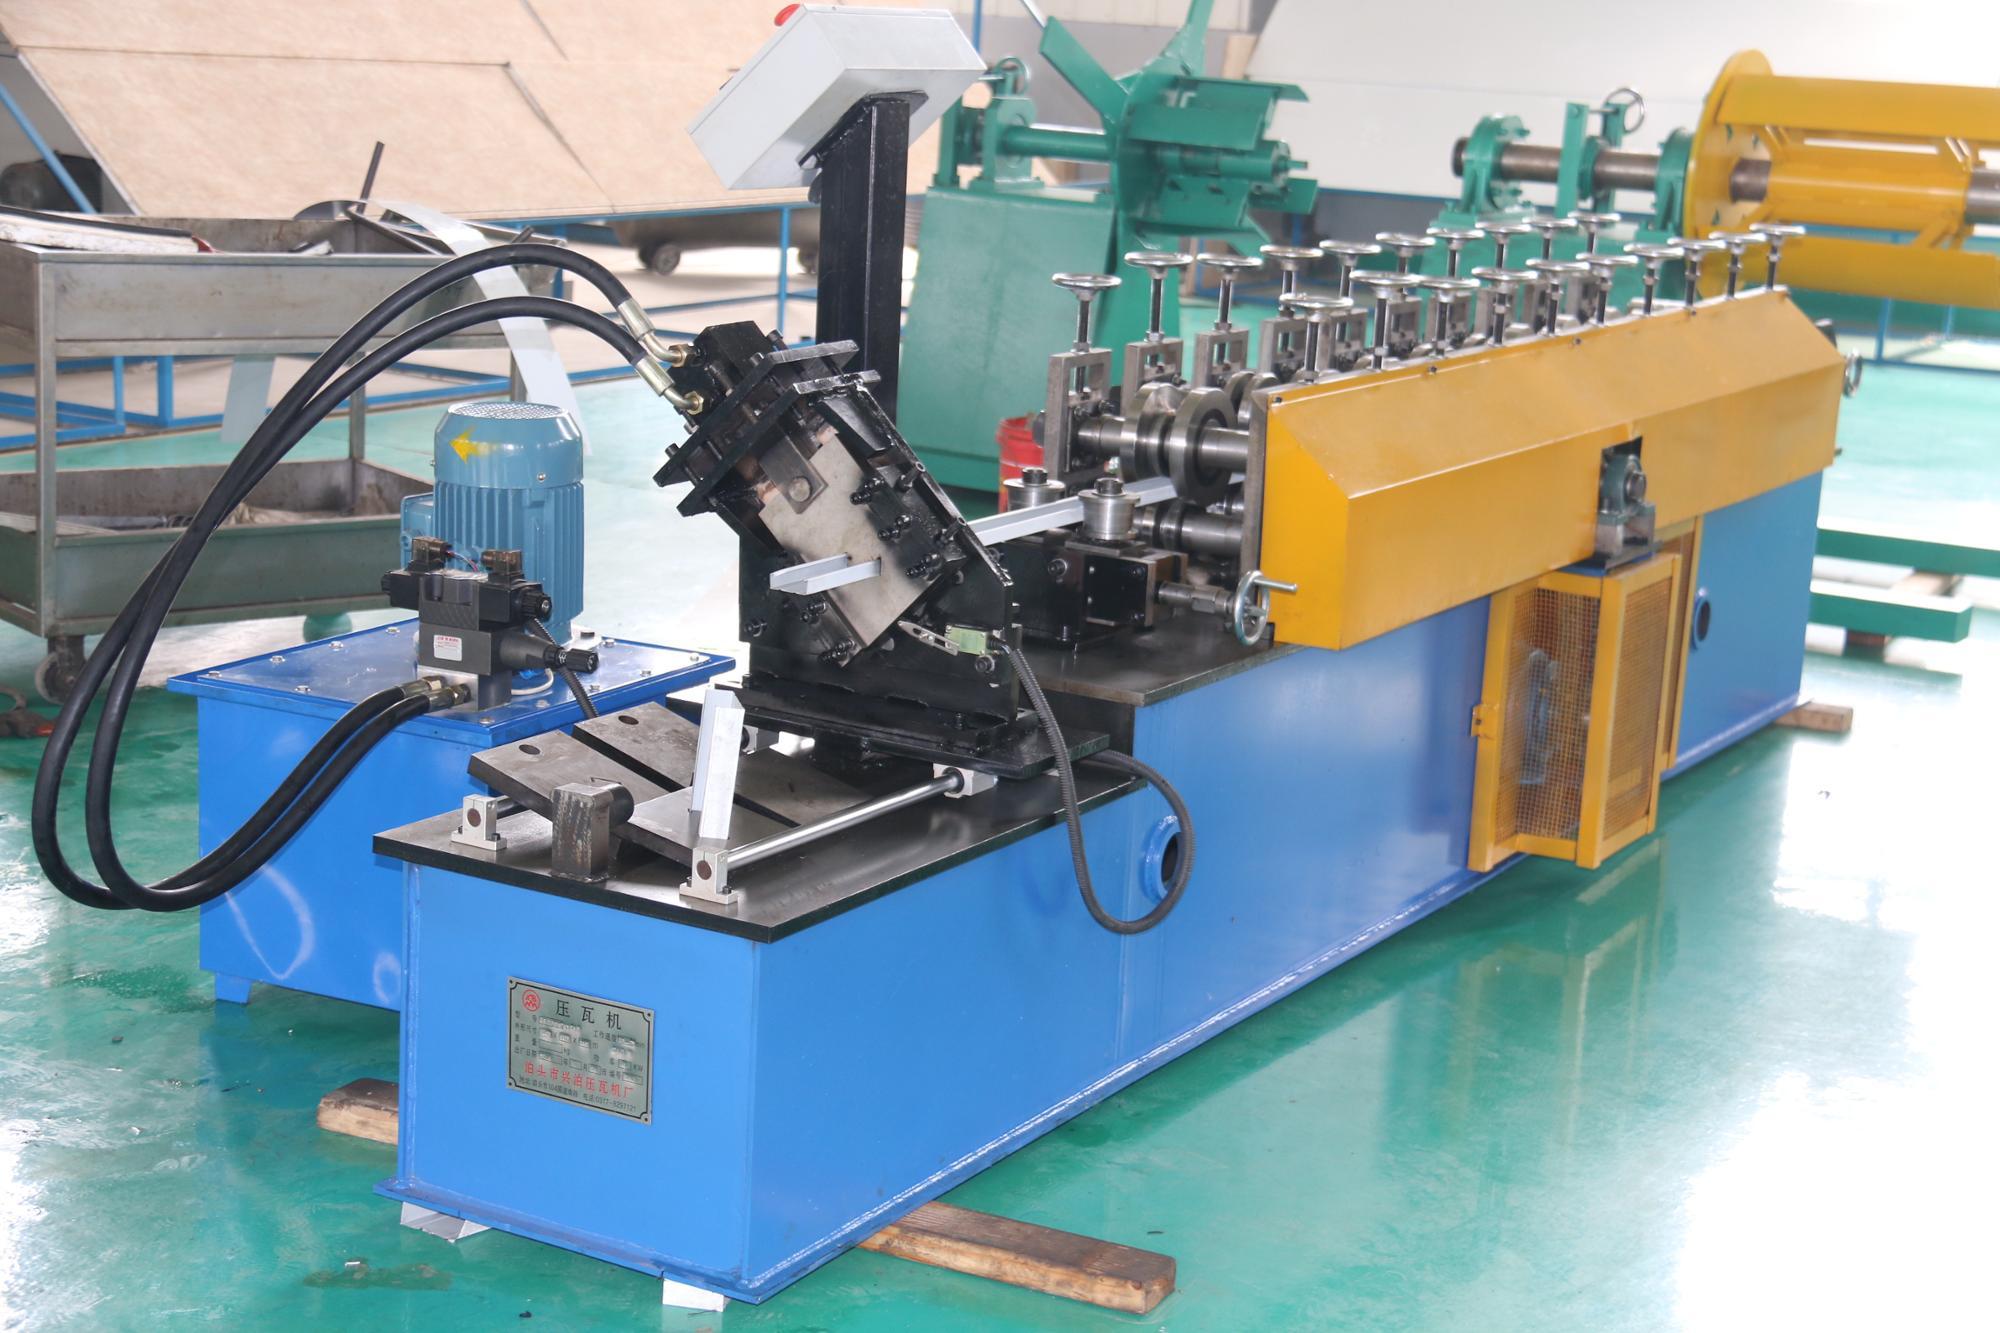 Cnc Bending Metal U Bar Stud Track Making Machine - Buy